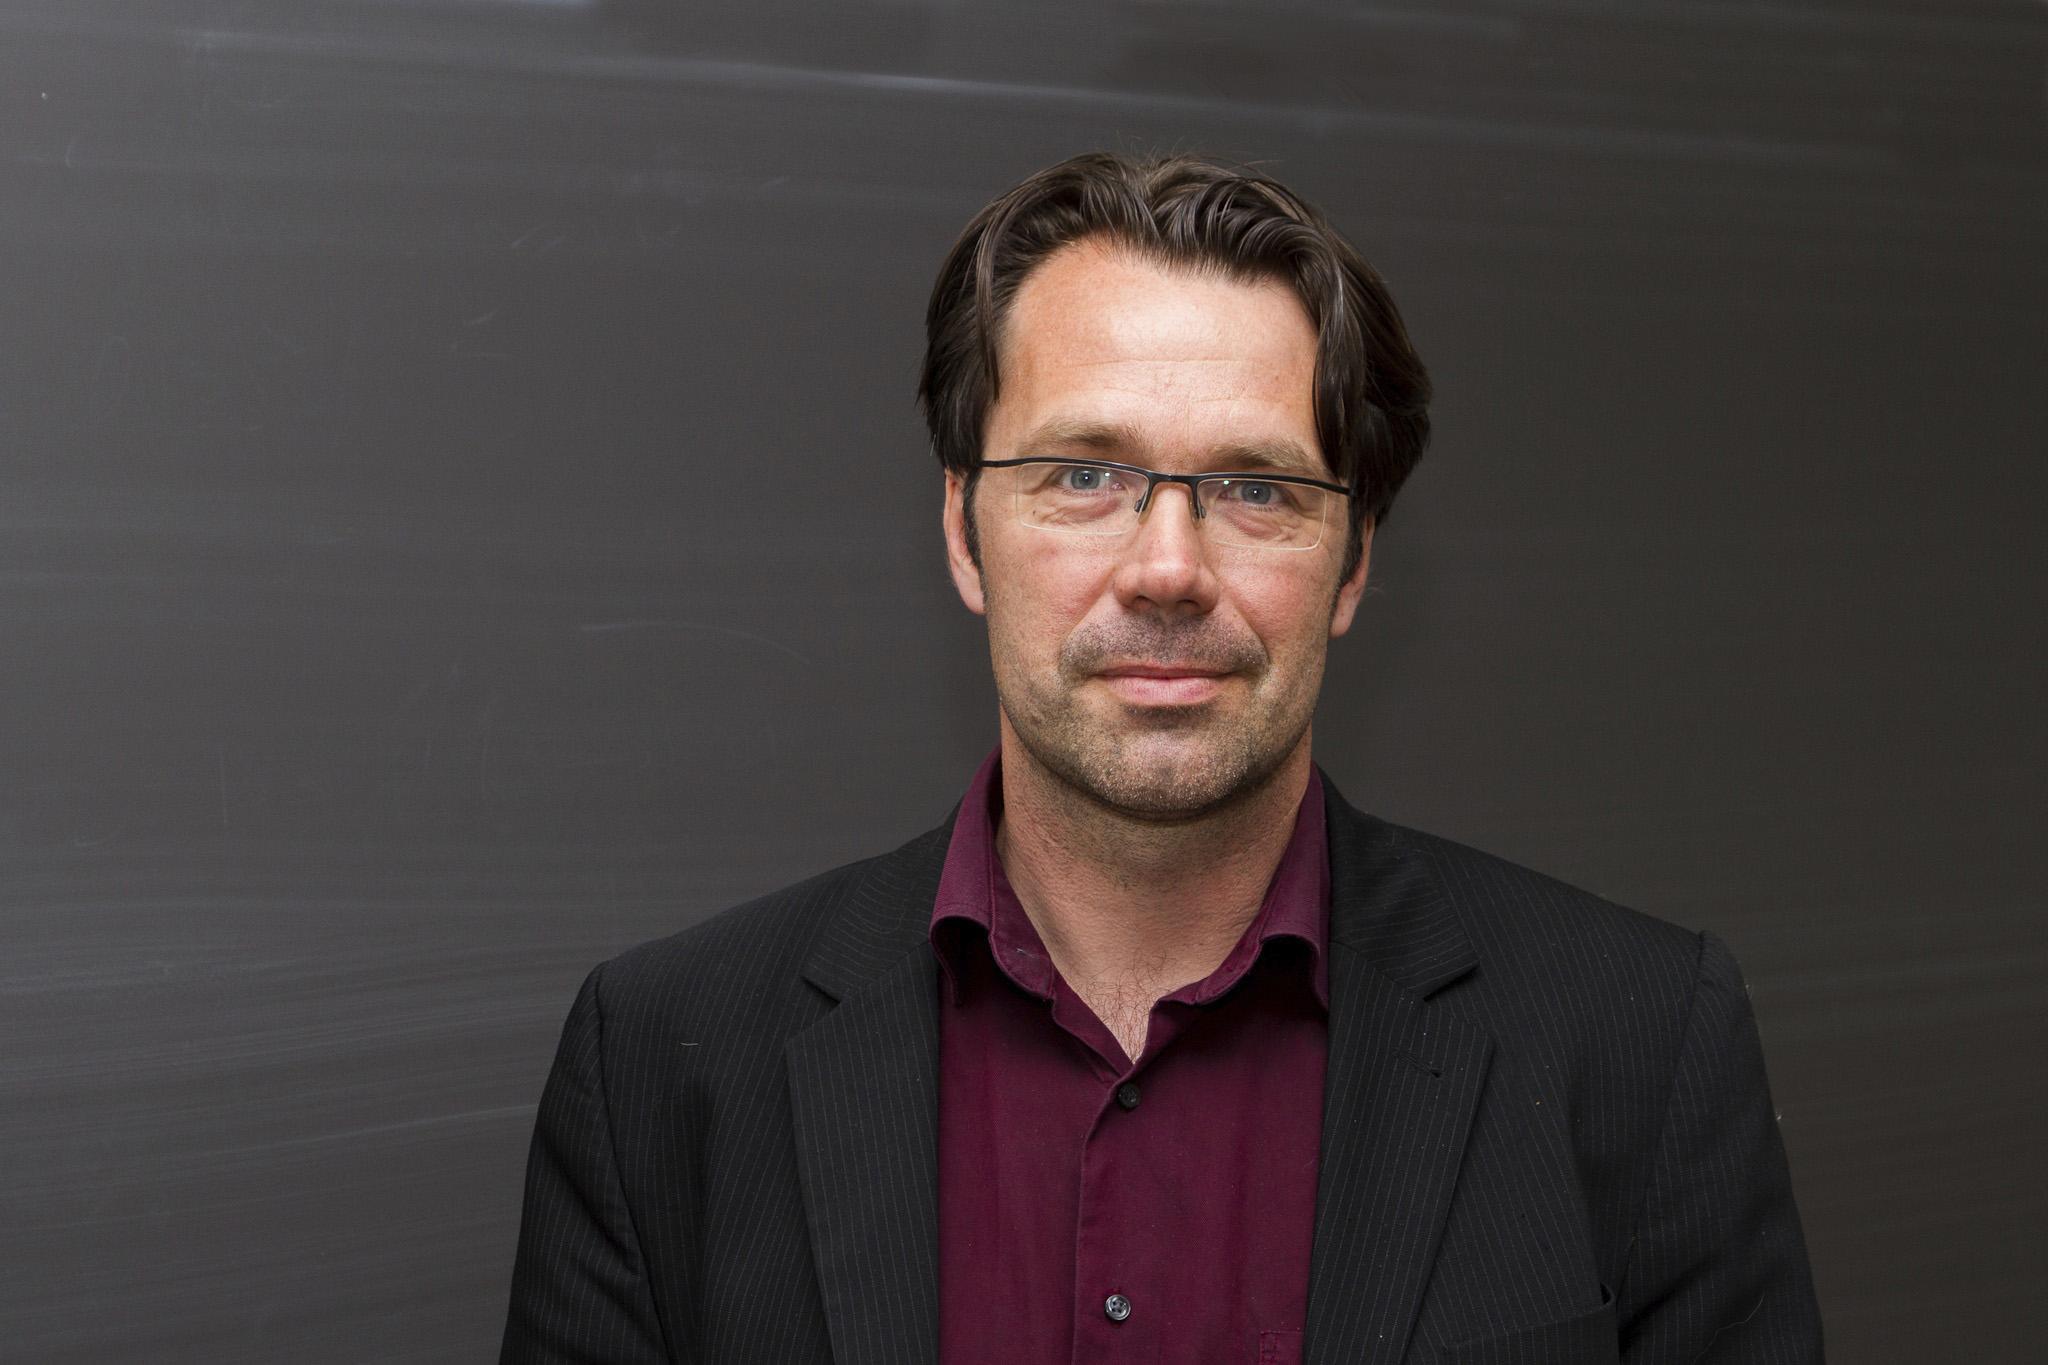 Søren Eilers